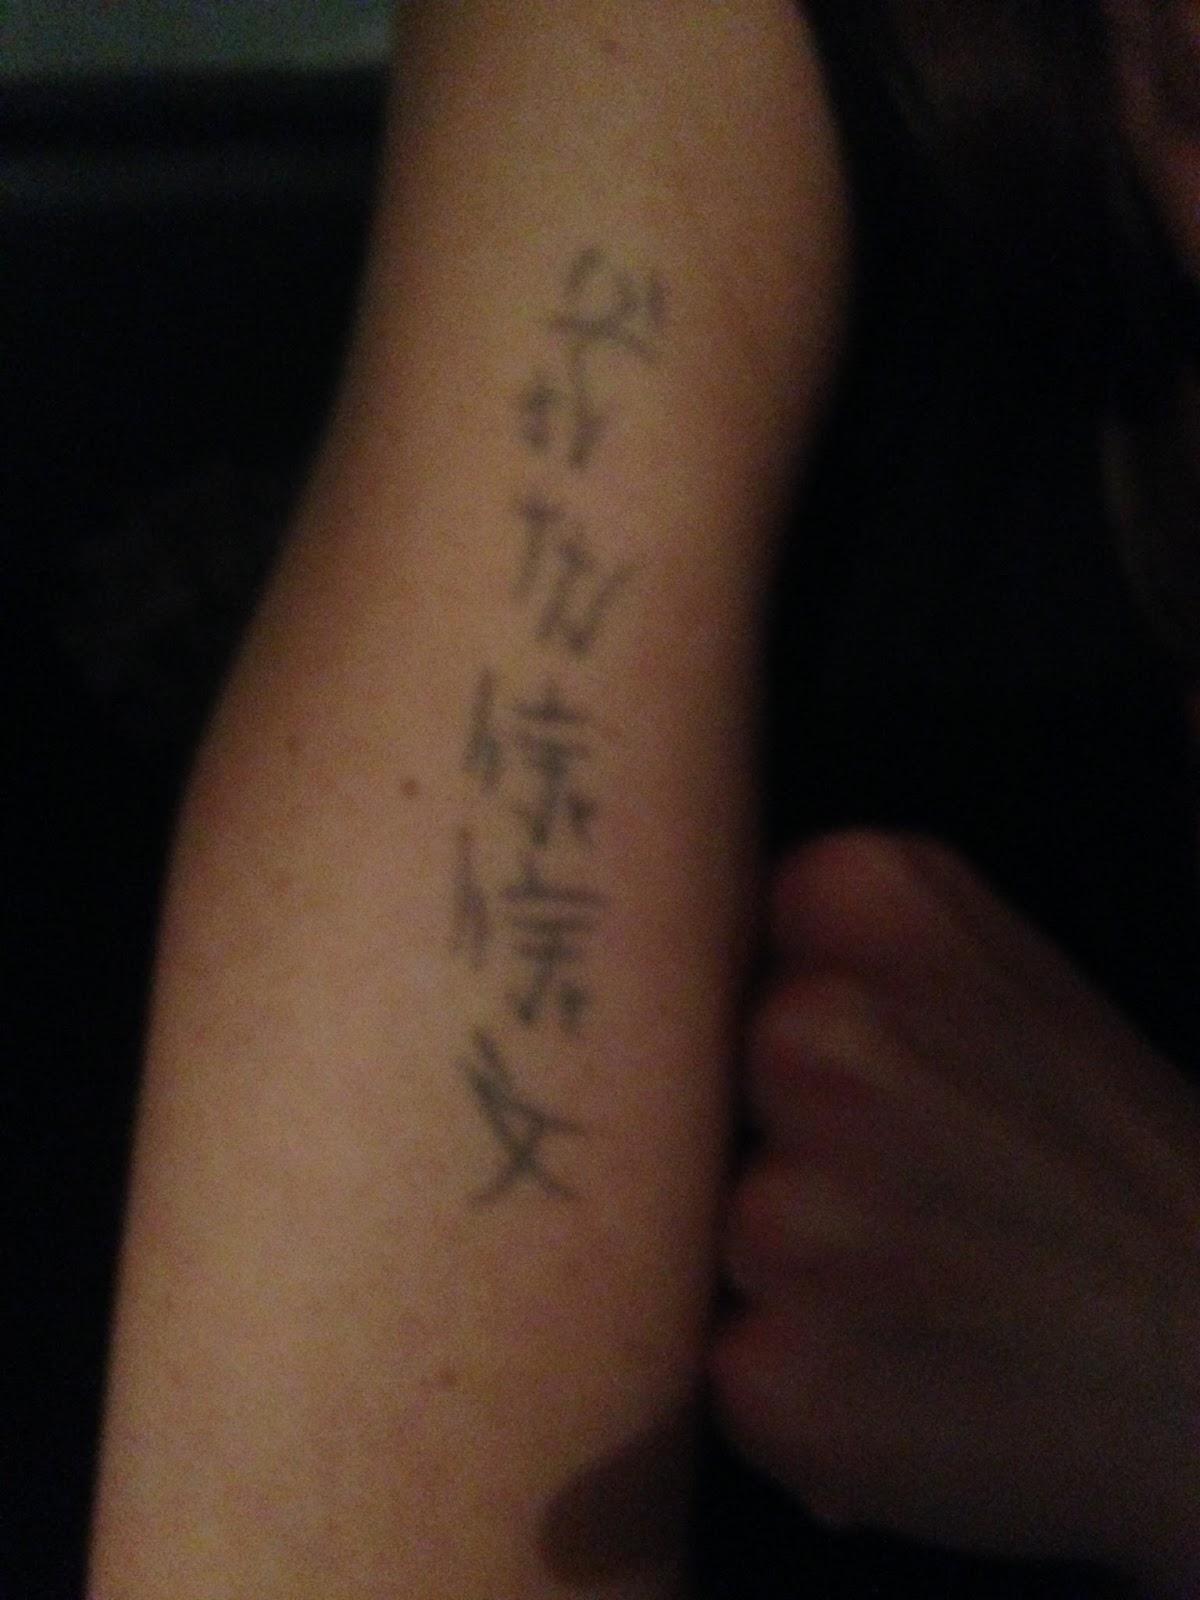 Chinese tattoo fail blog dating